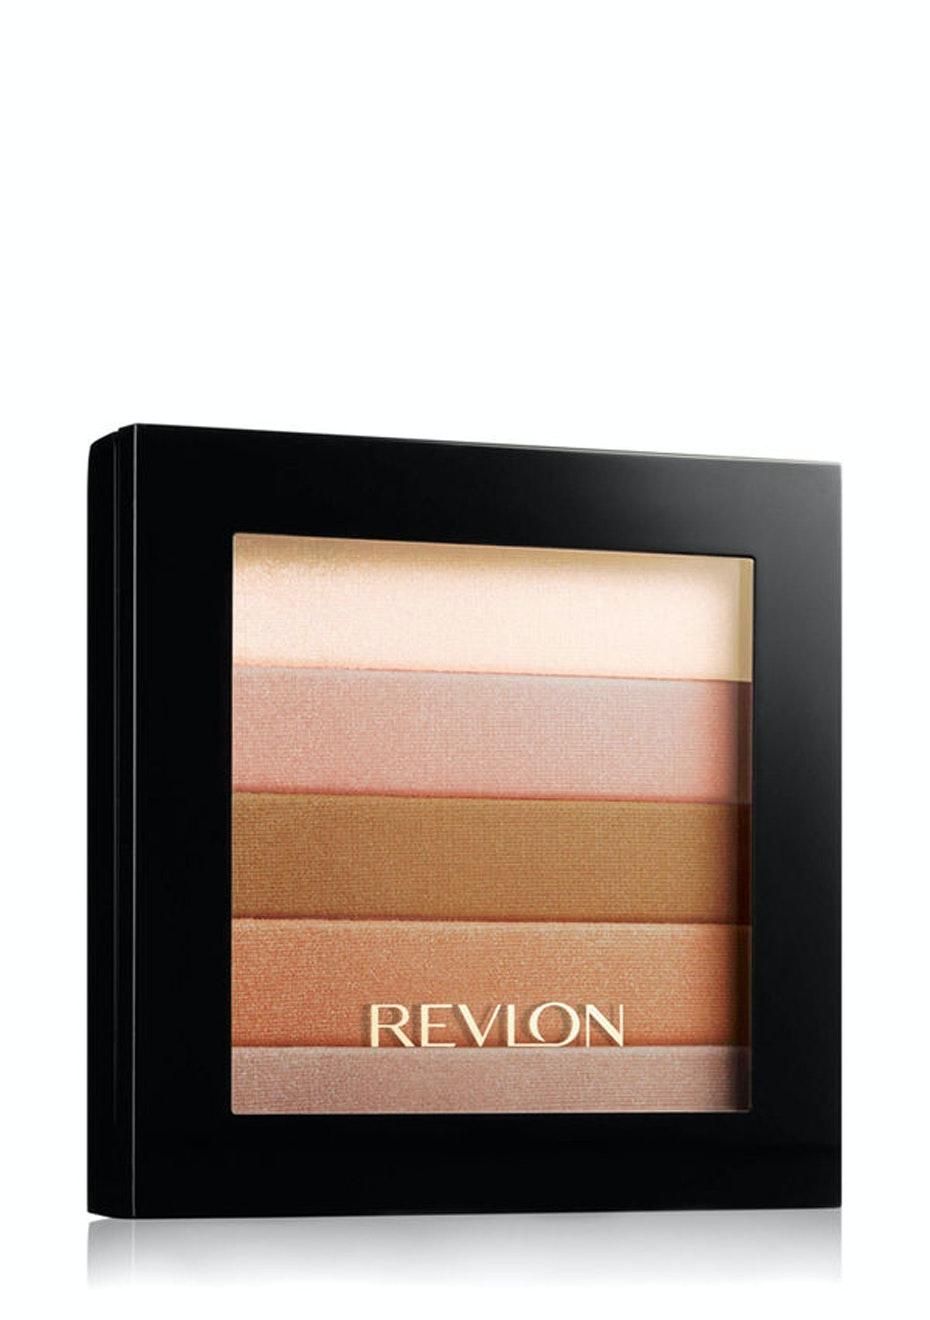 Revlon Highlighting Palette 030 Bronze Glow